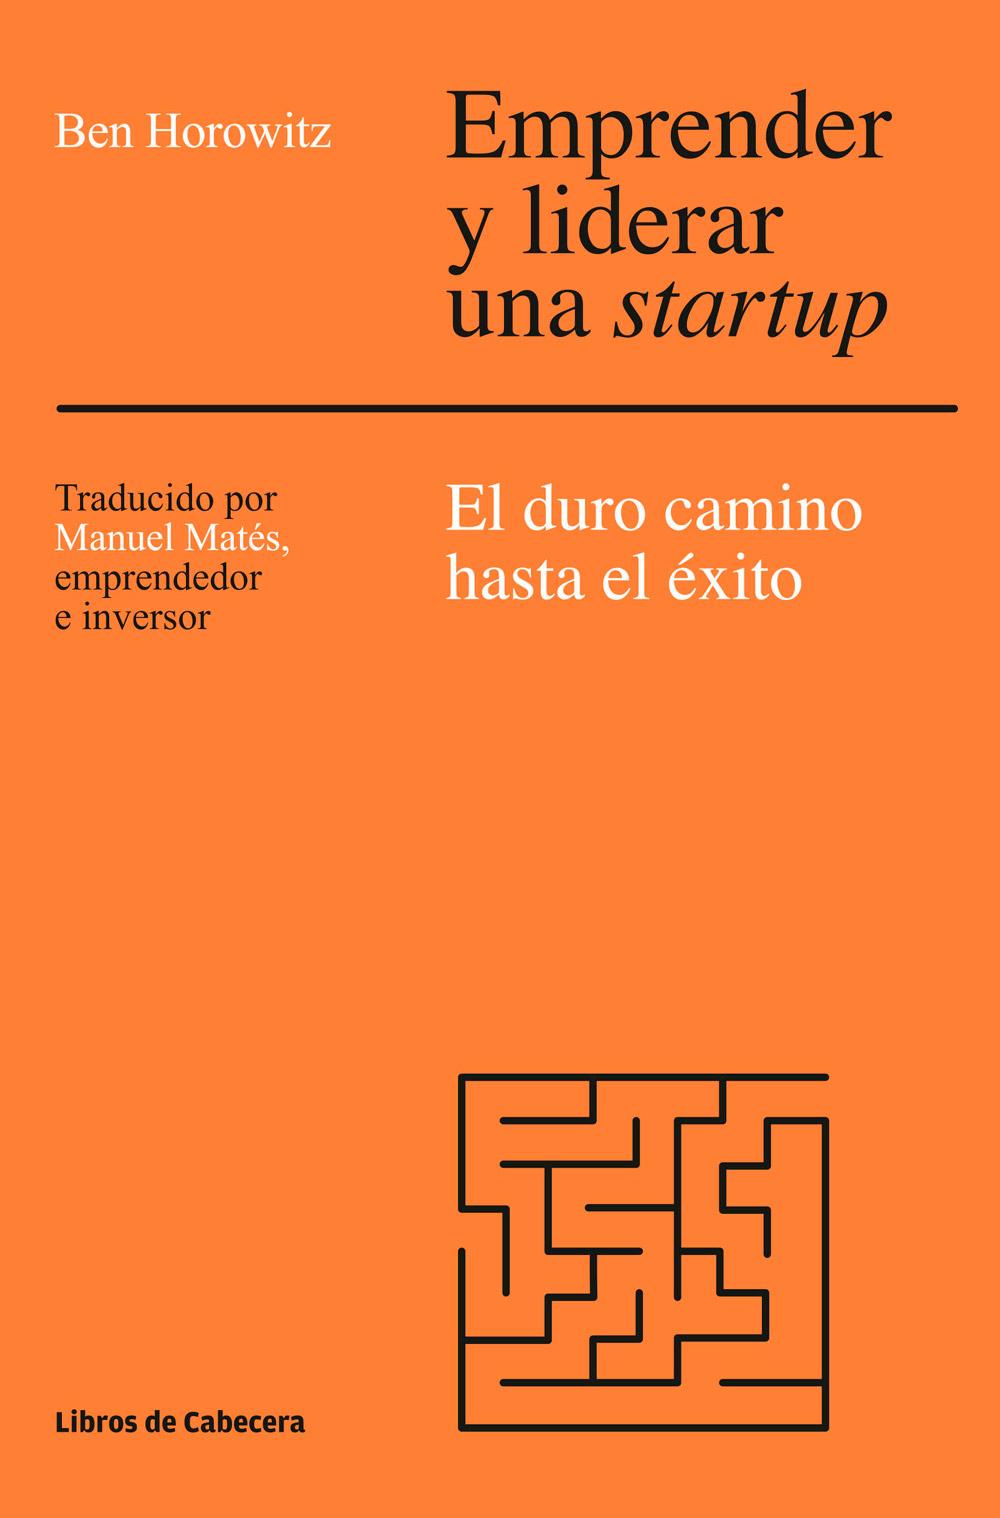 emprendery liderar una startup